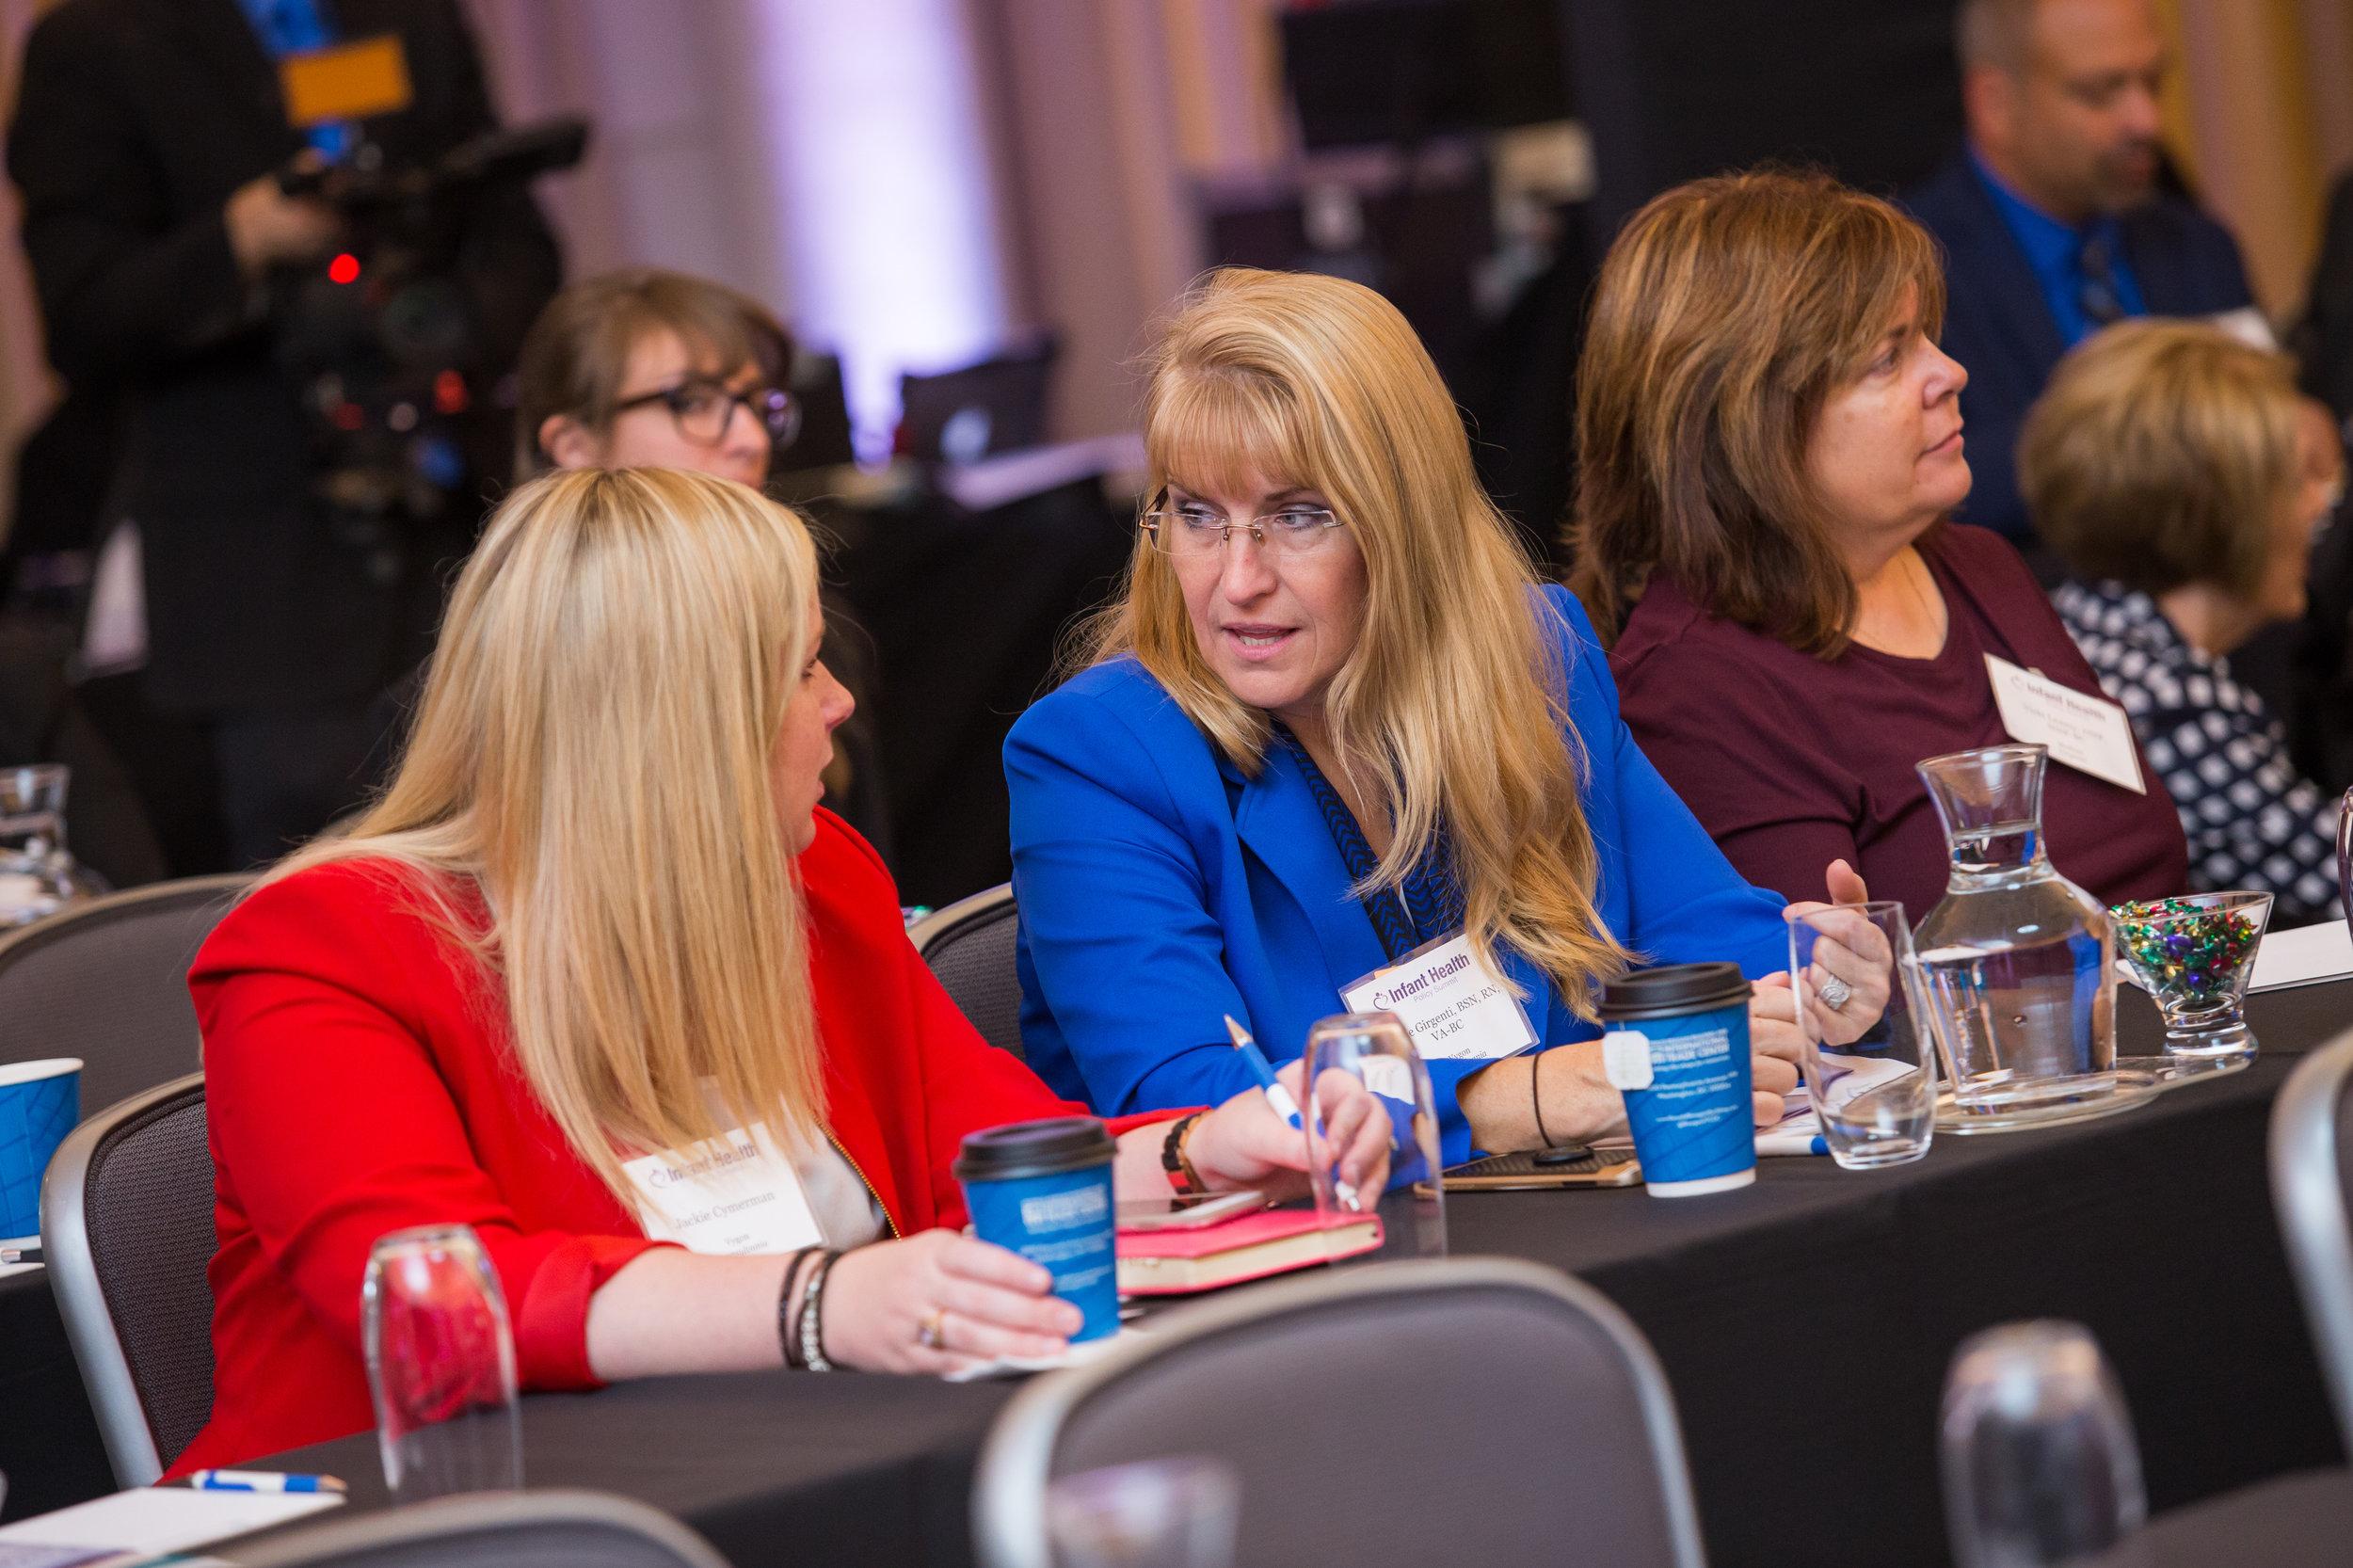 Infant Health Policy Summit - Jason Dixson Photography - 085542 - 1008.jpg